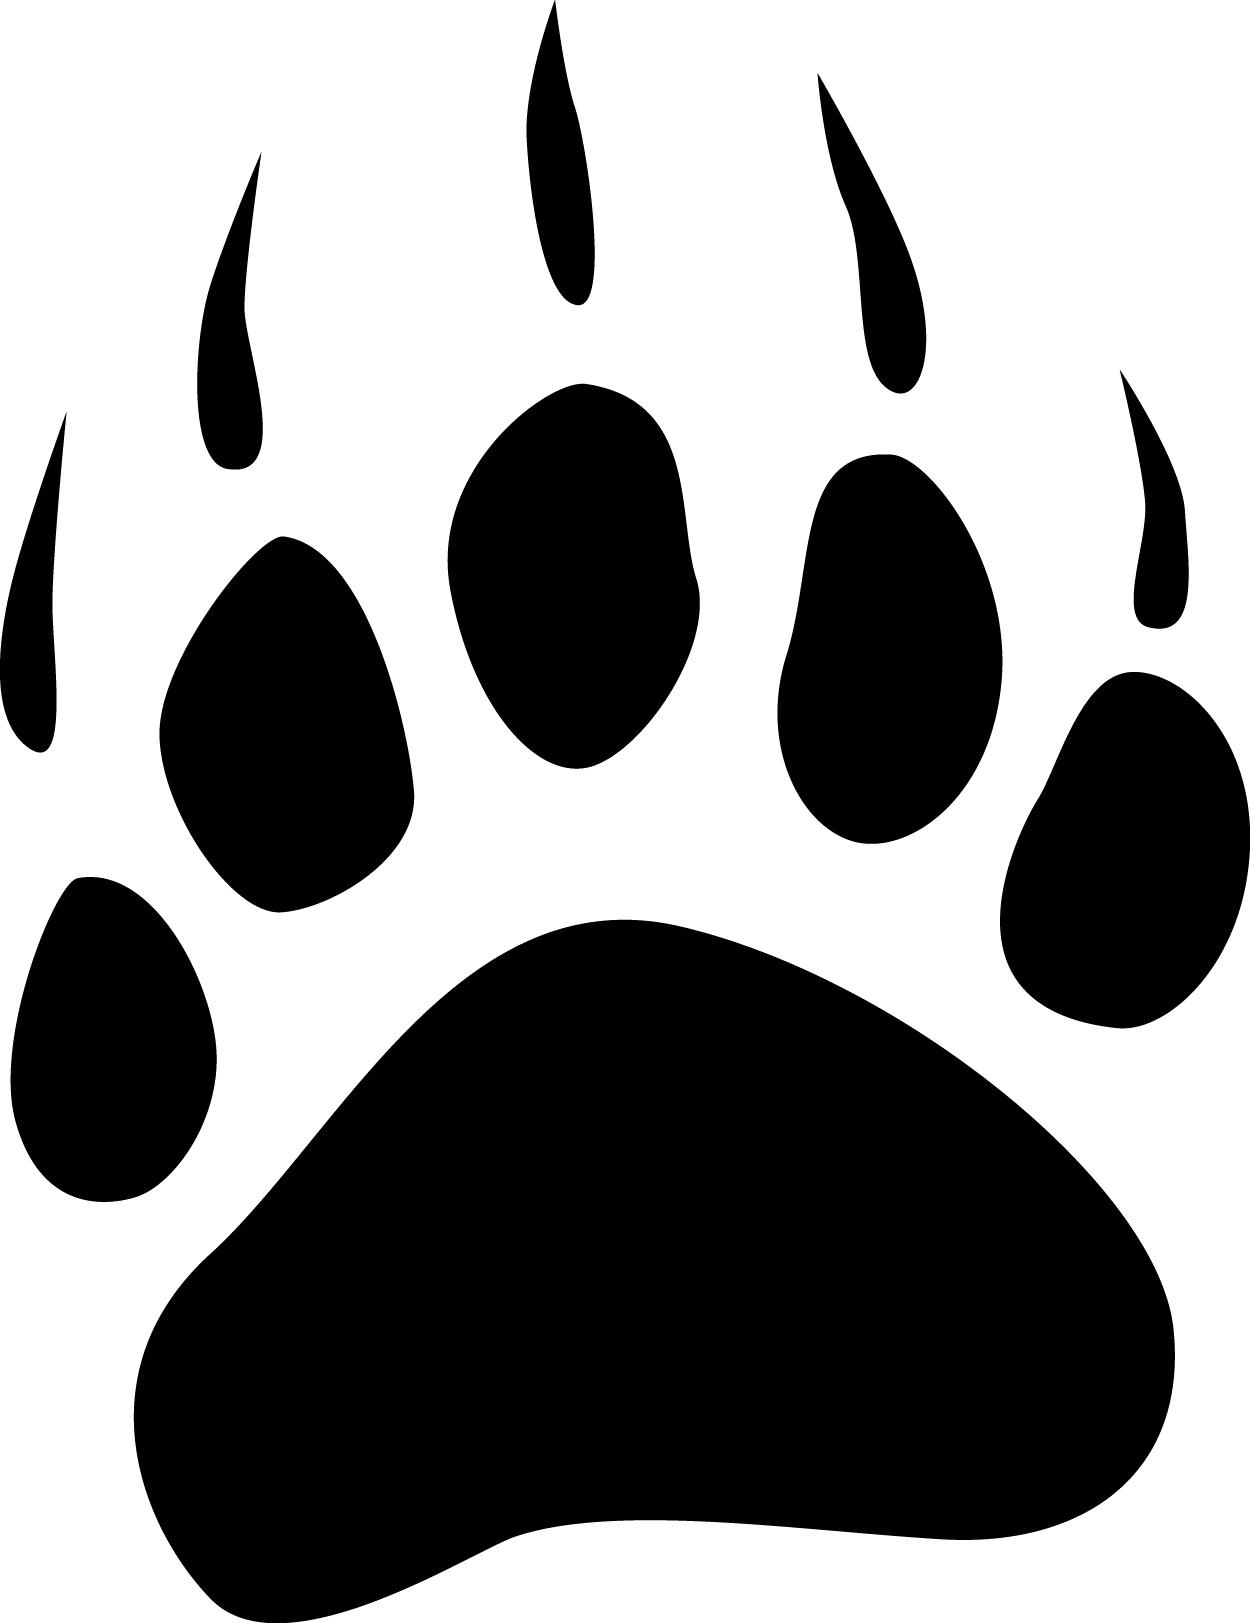 ursus-bear-print.png